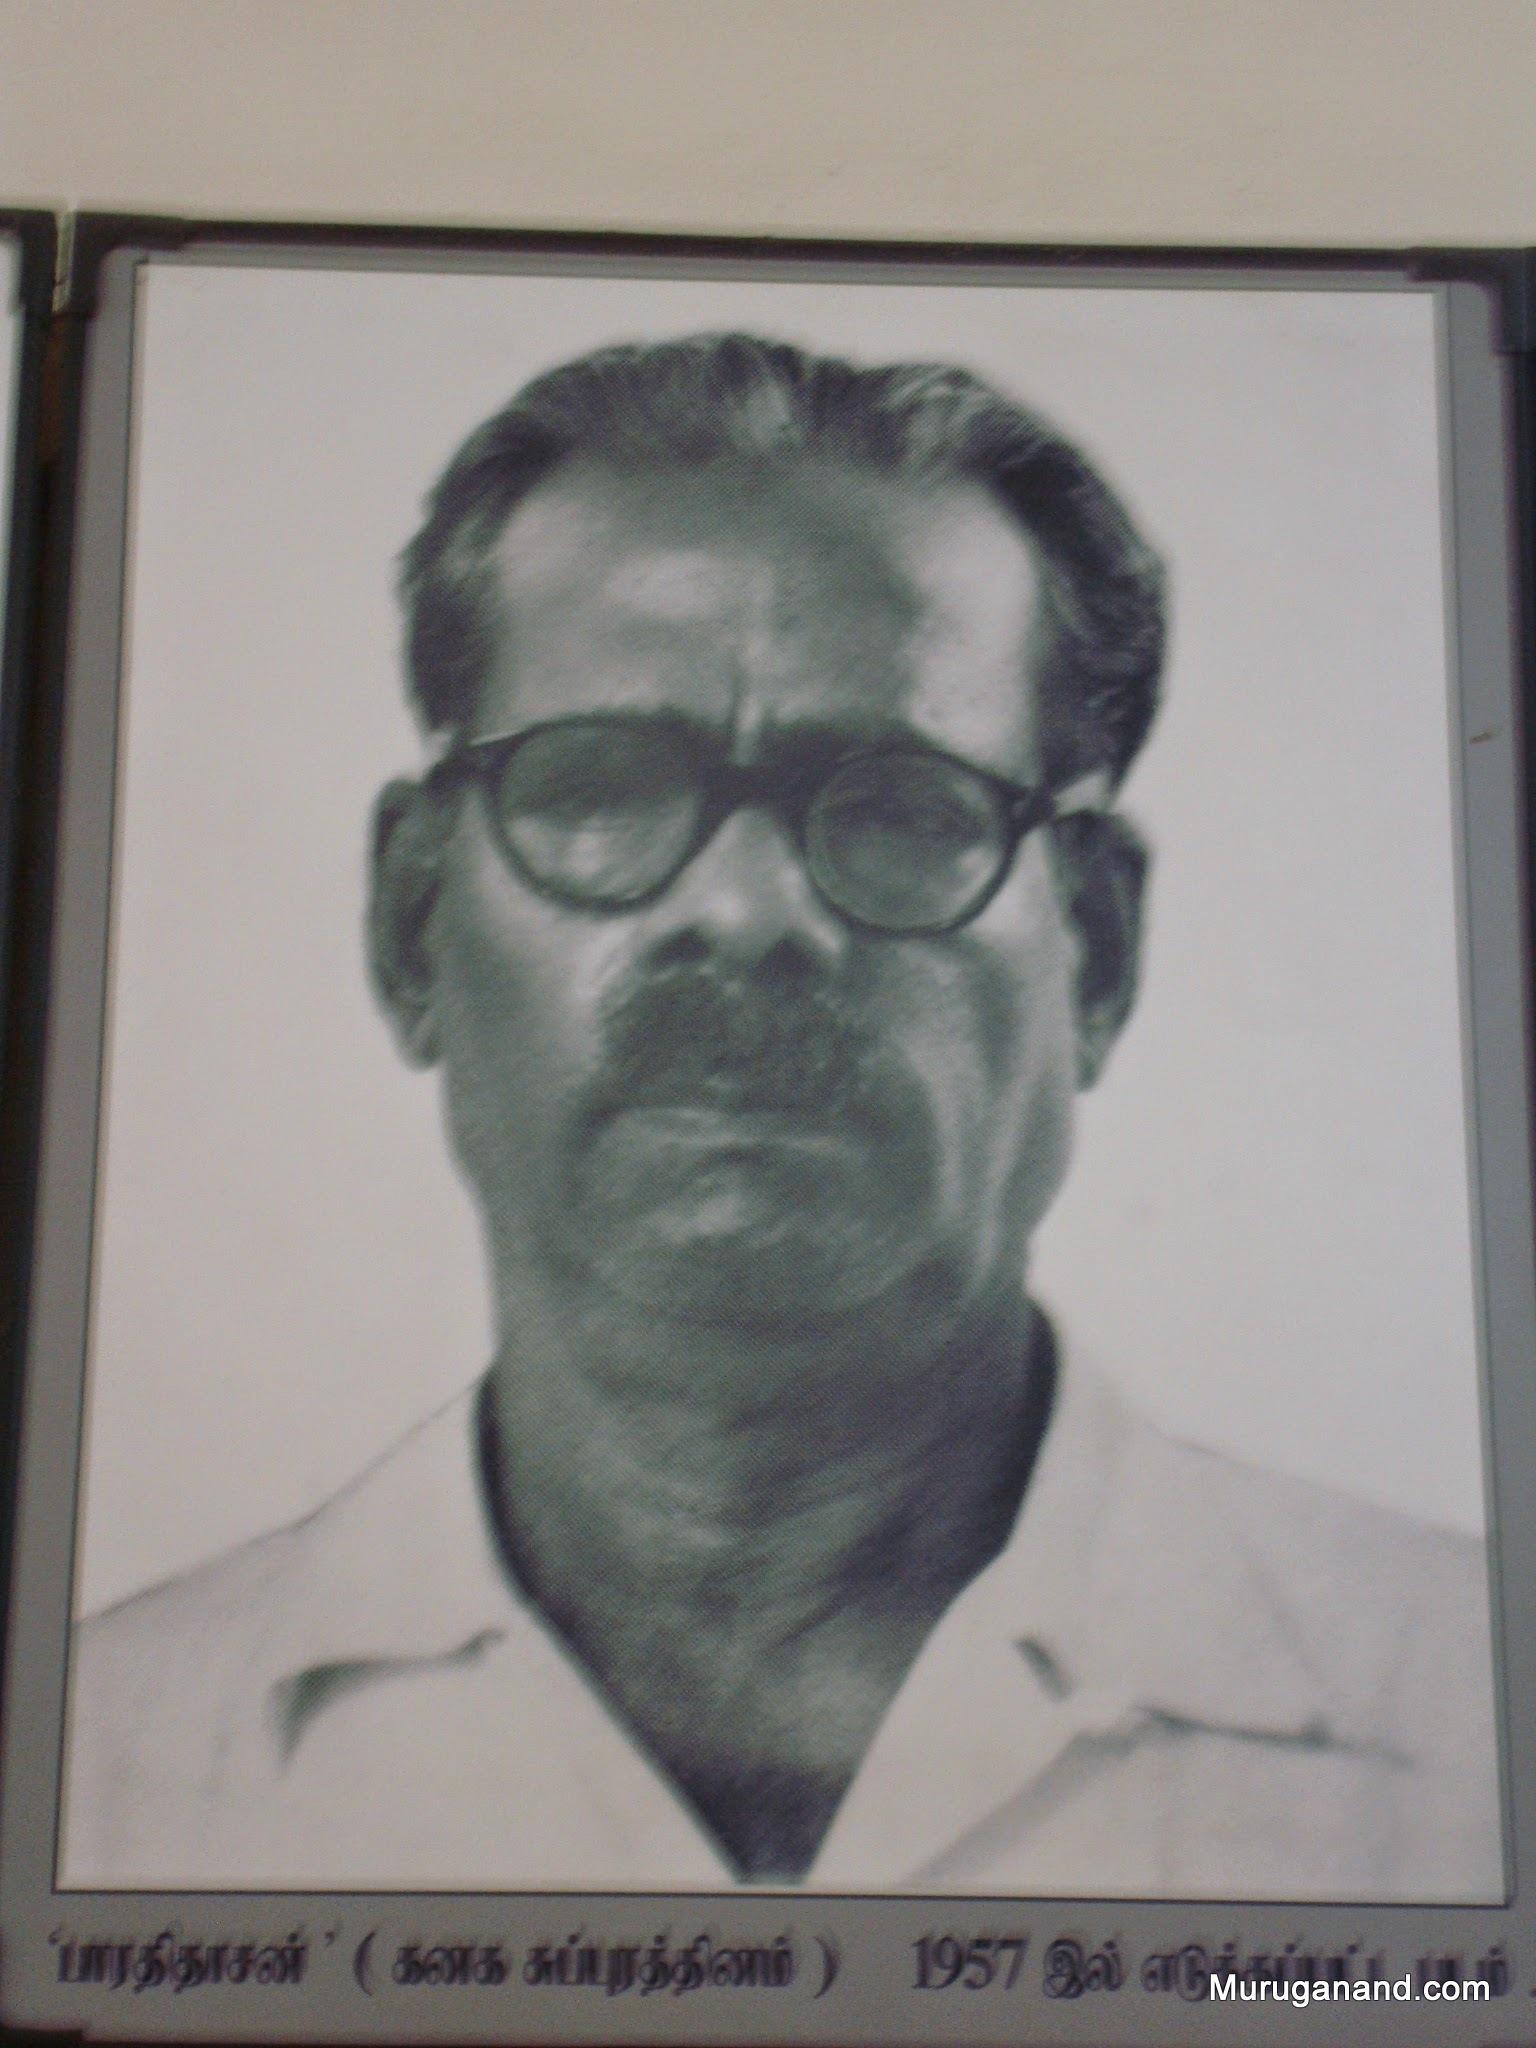 Bharatidasan a friend, student and a true admirer of Bharati